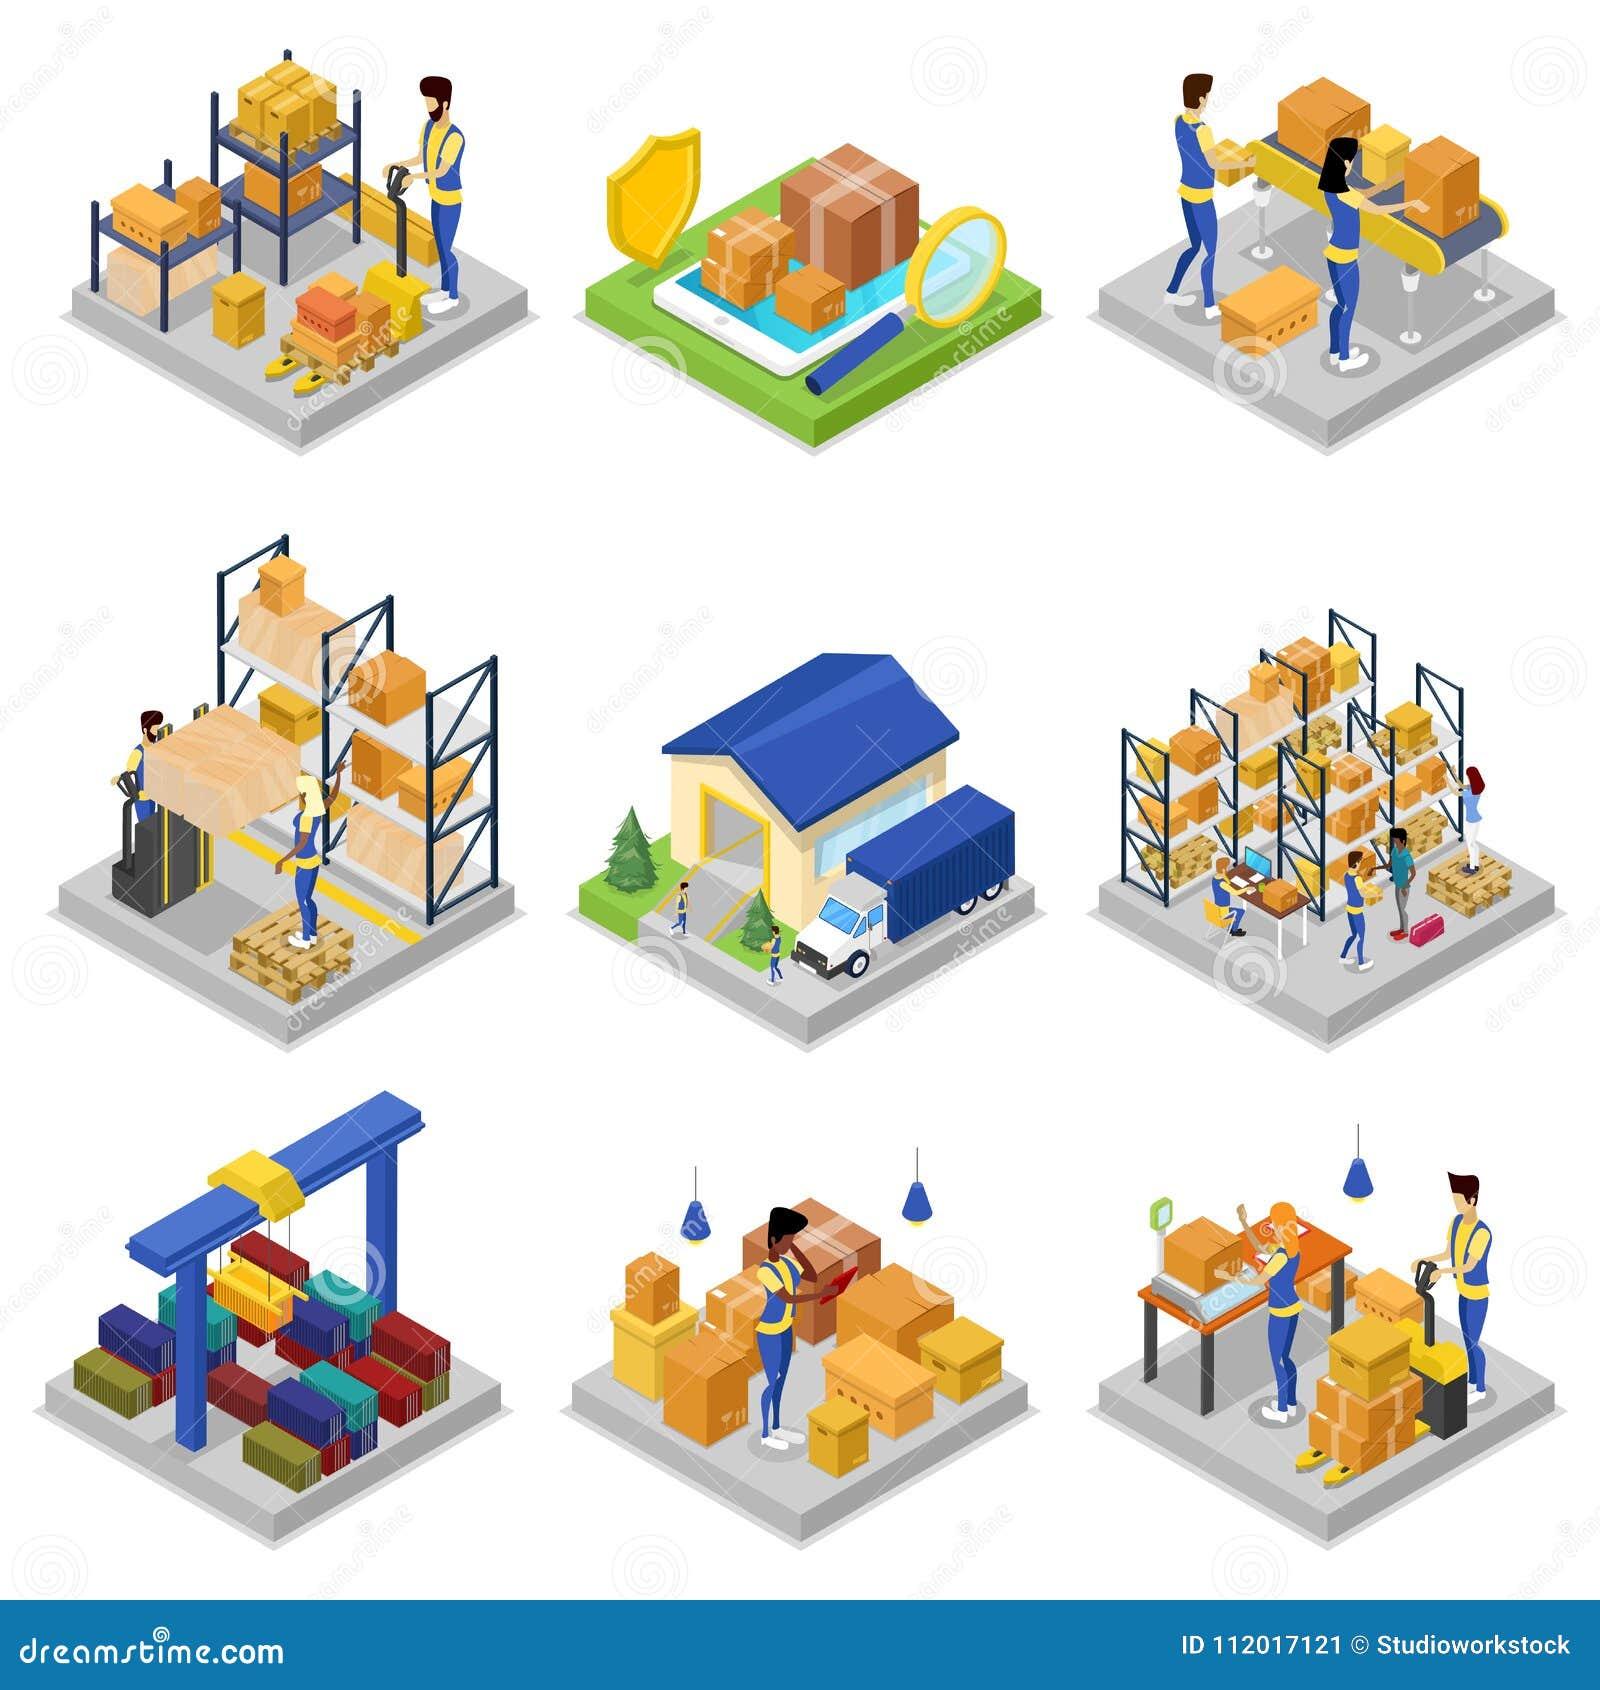 Warehouse Management Isometric 3D Set Stock Vector - Illustration of